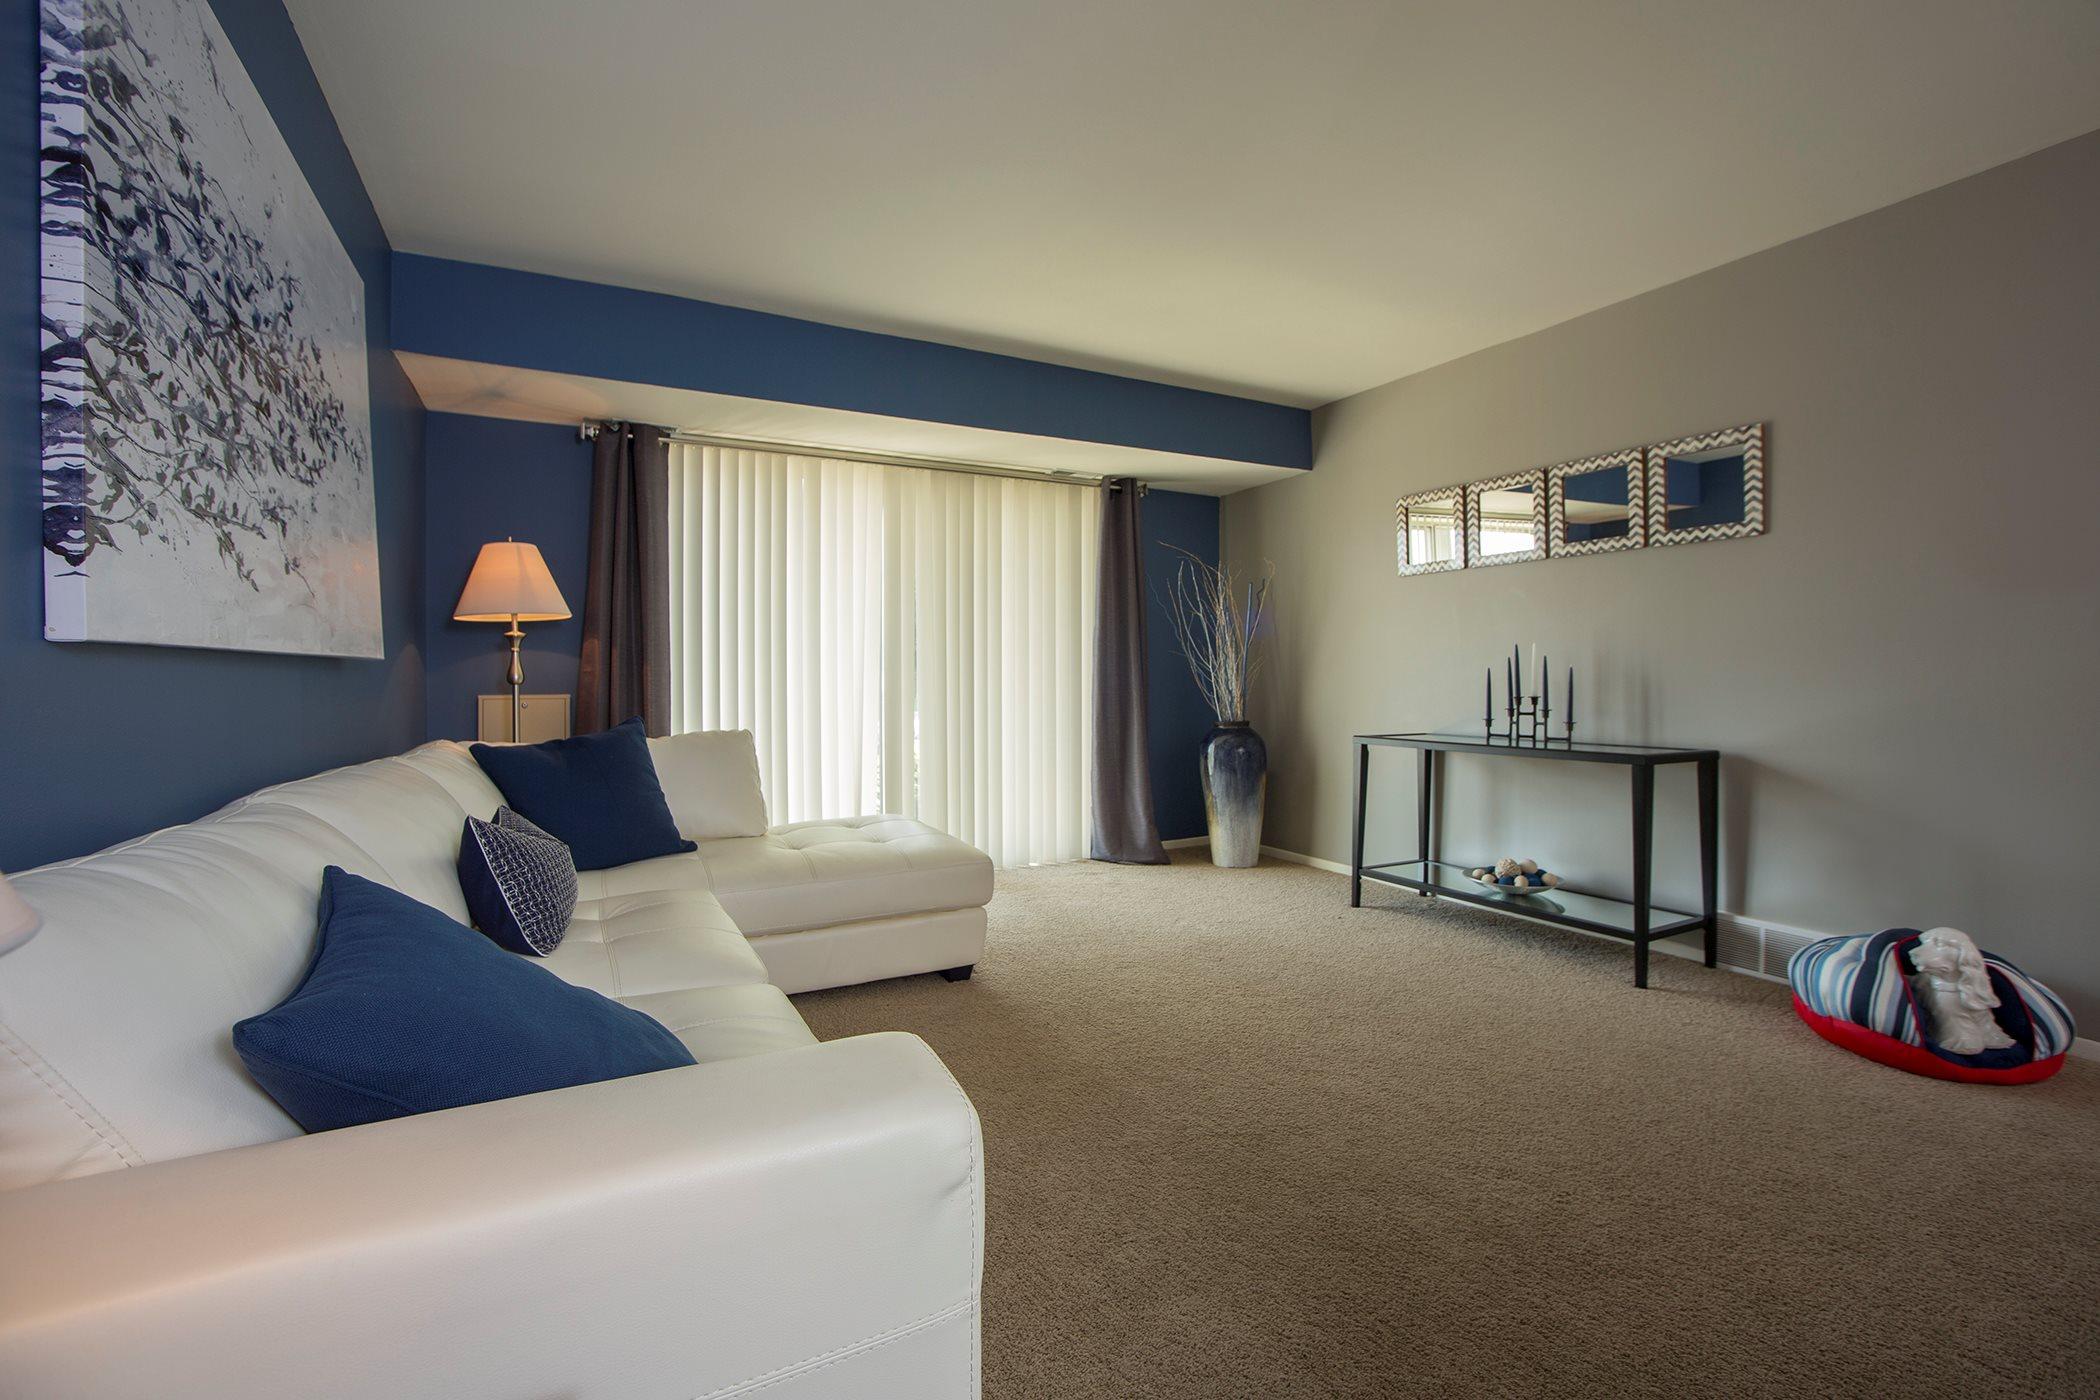 Westwood village apartments in westland mi 734 961 4 for One bedroom apartments in westland mi